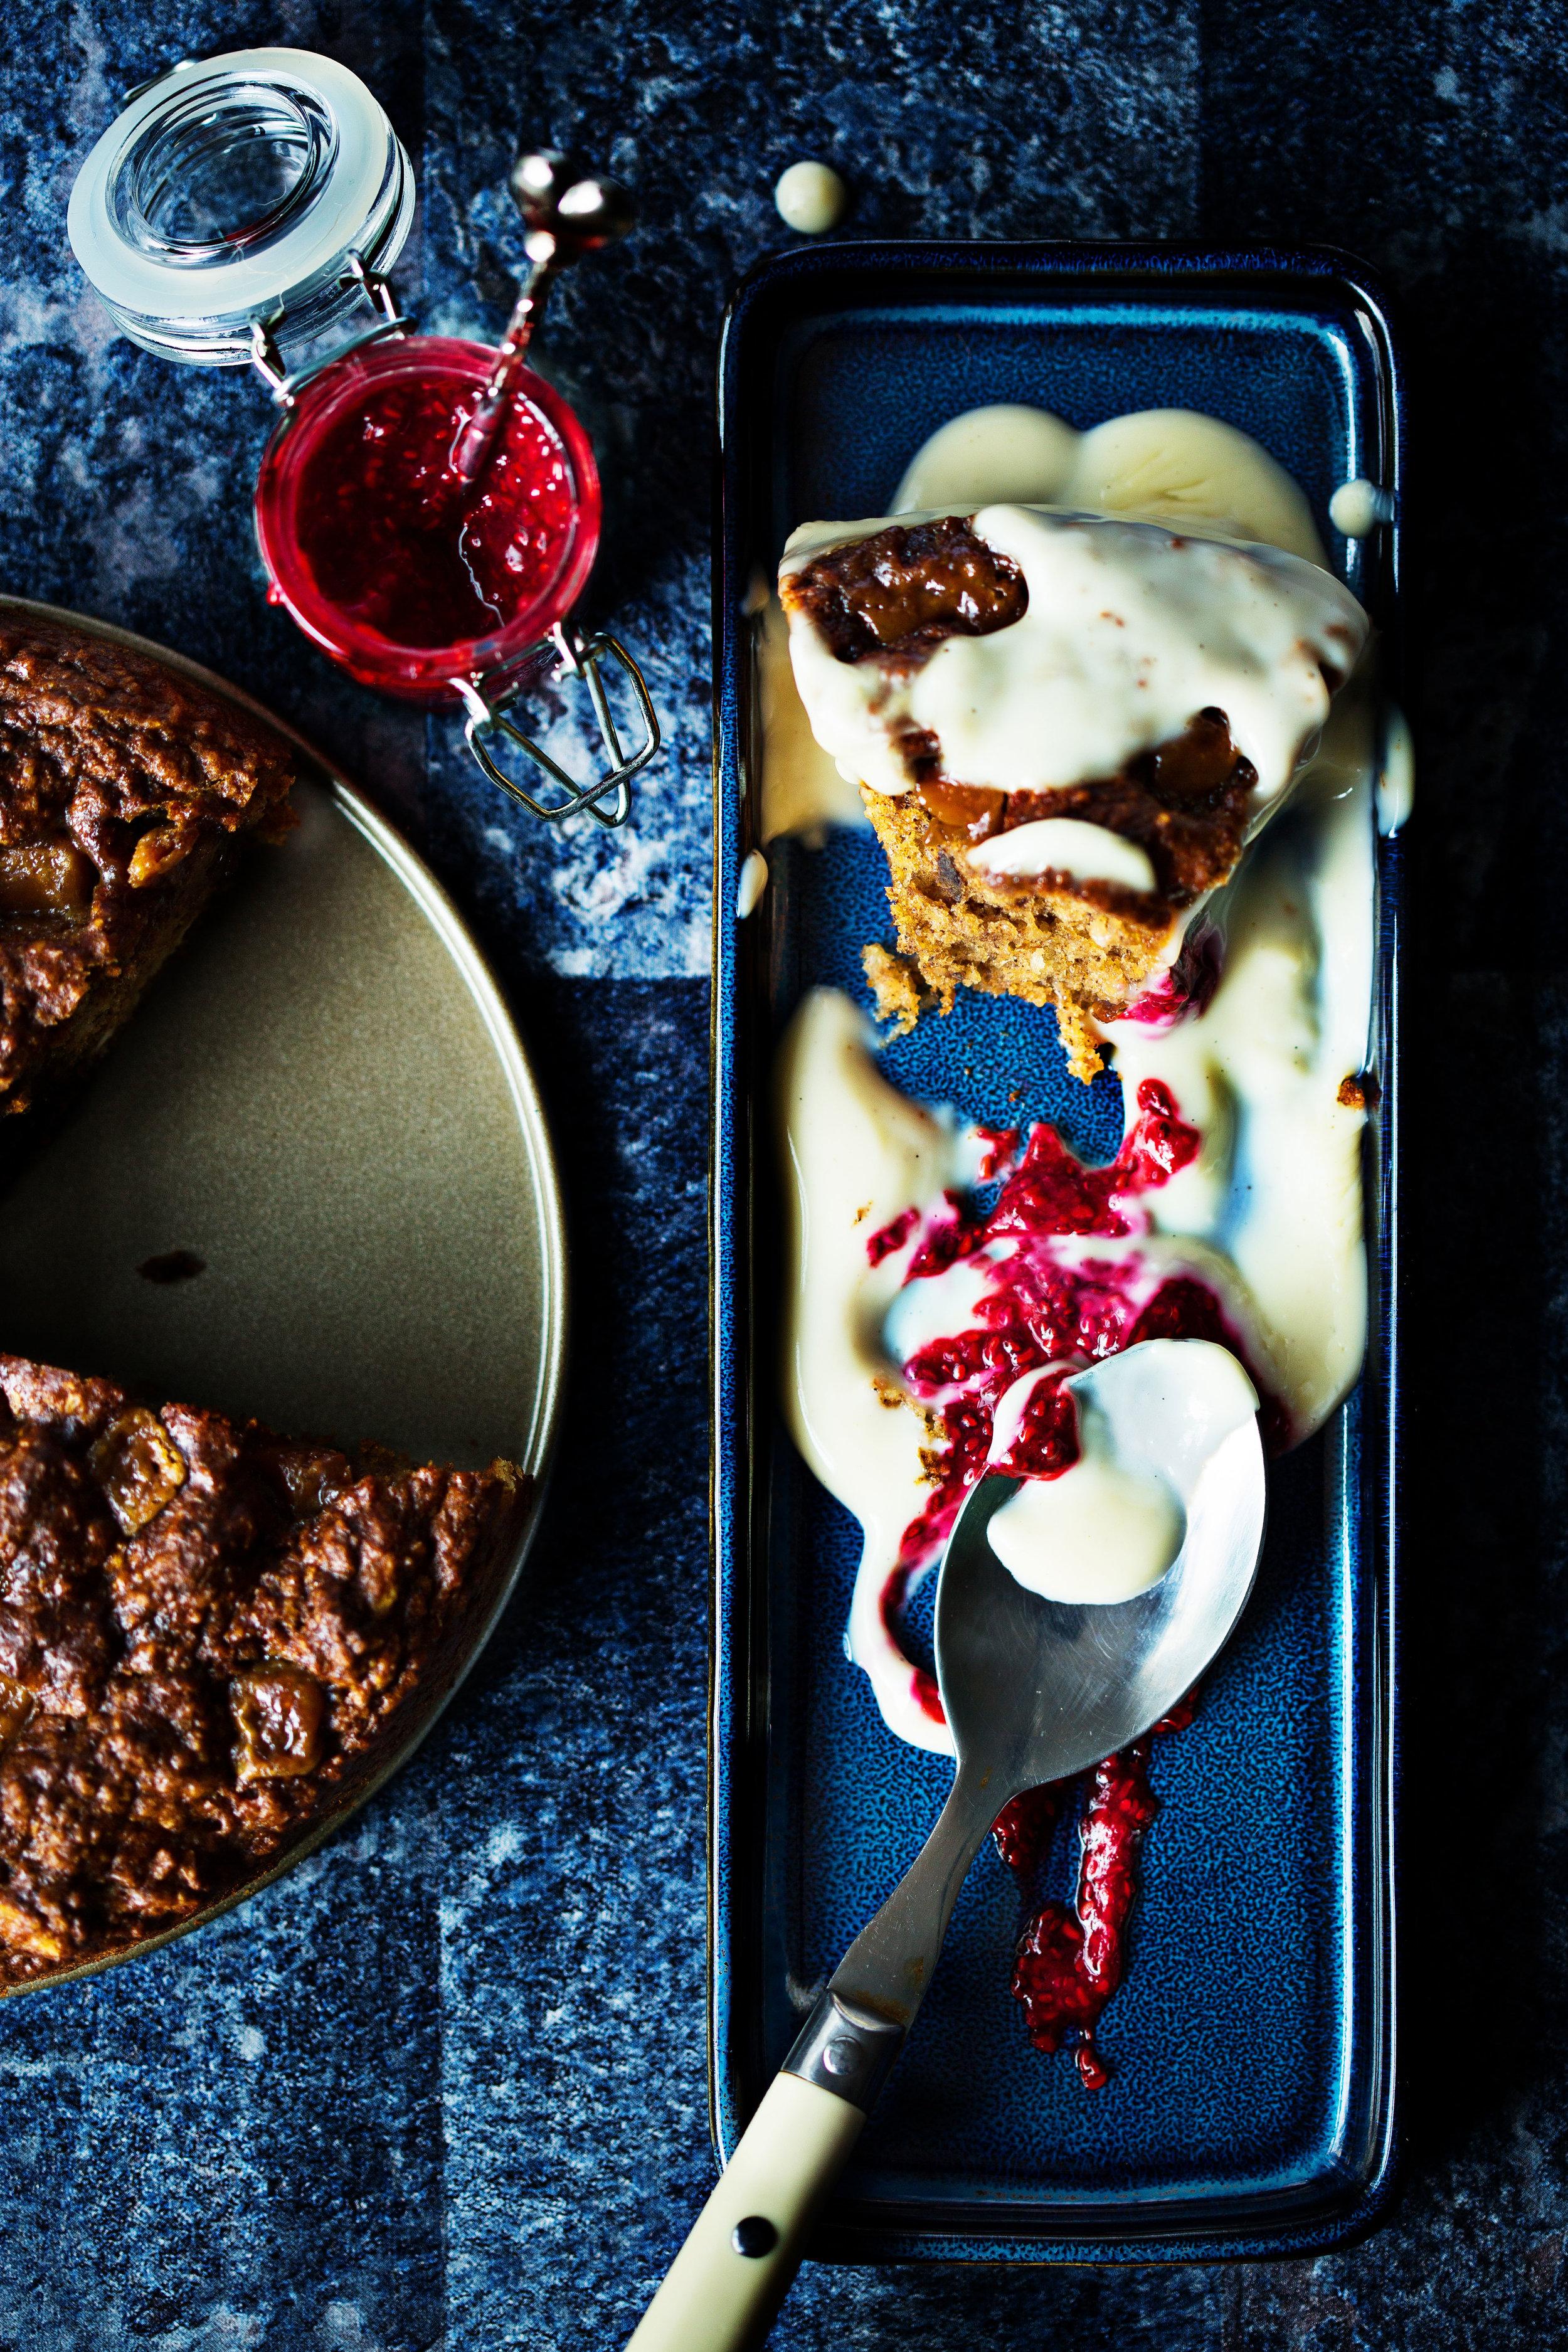 Jam-and-custard-banana-cake.jpg